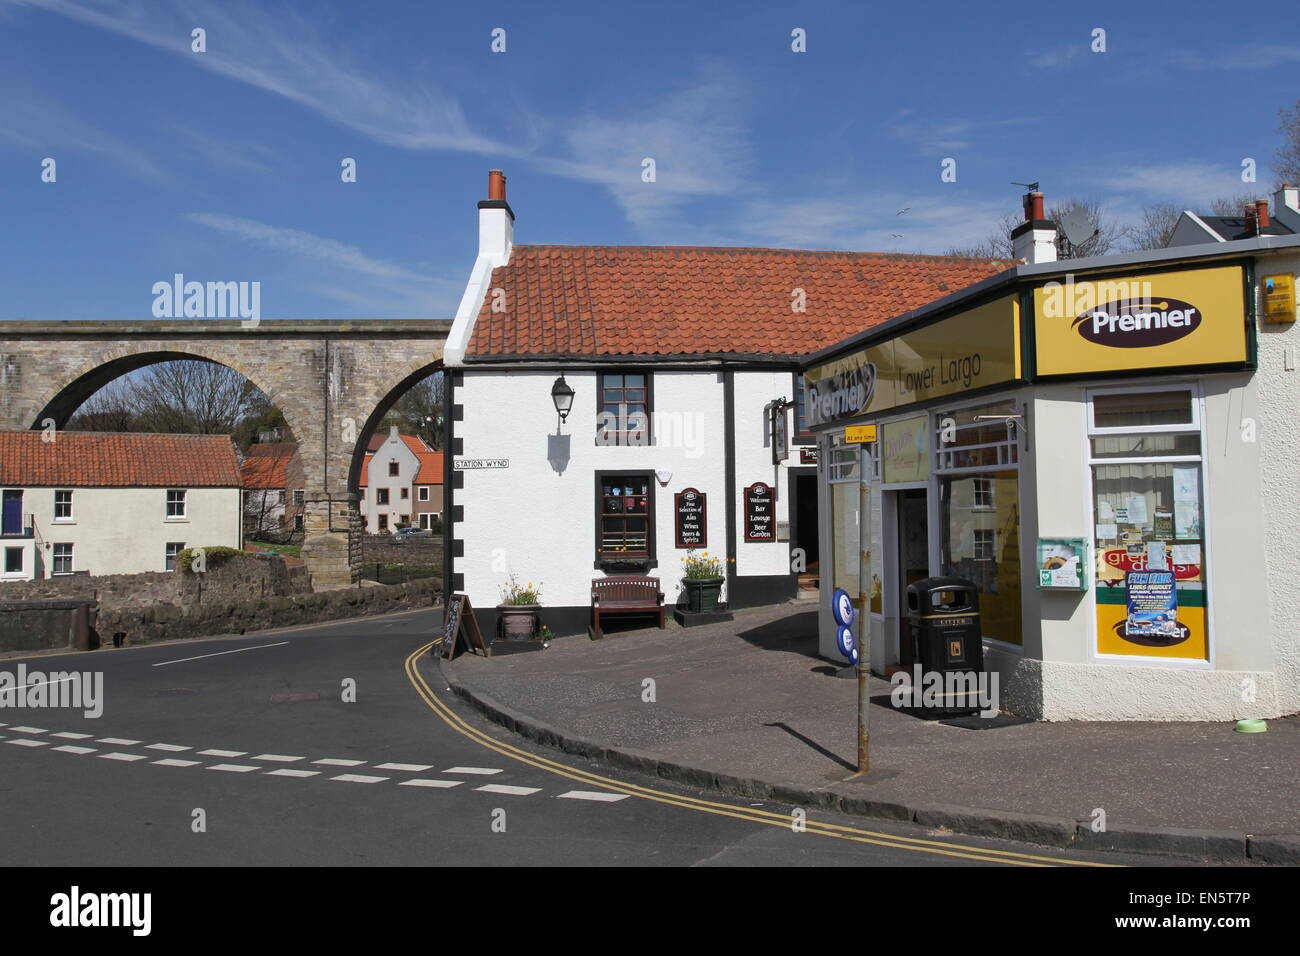 Village shop, Viaduct and Railway Inn Lower Largo Fife Scotland  April 2015 - Stock Image